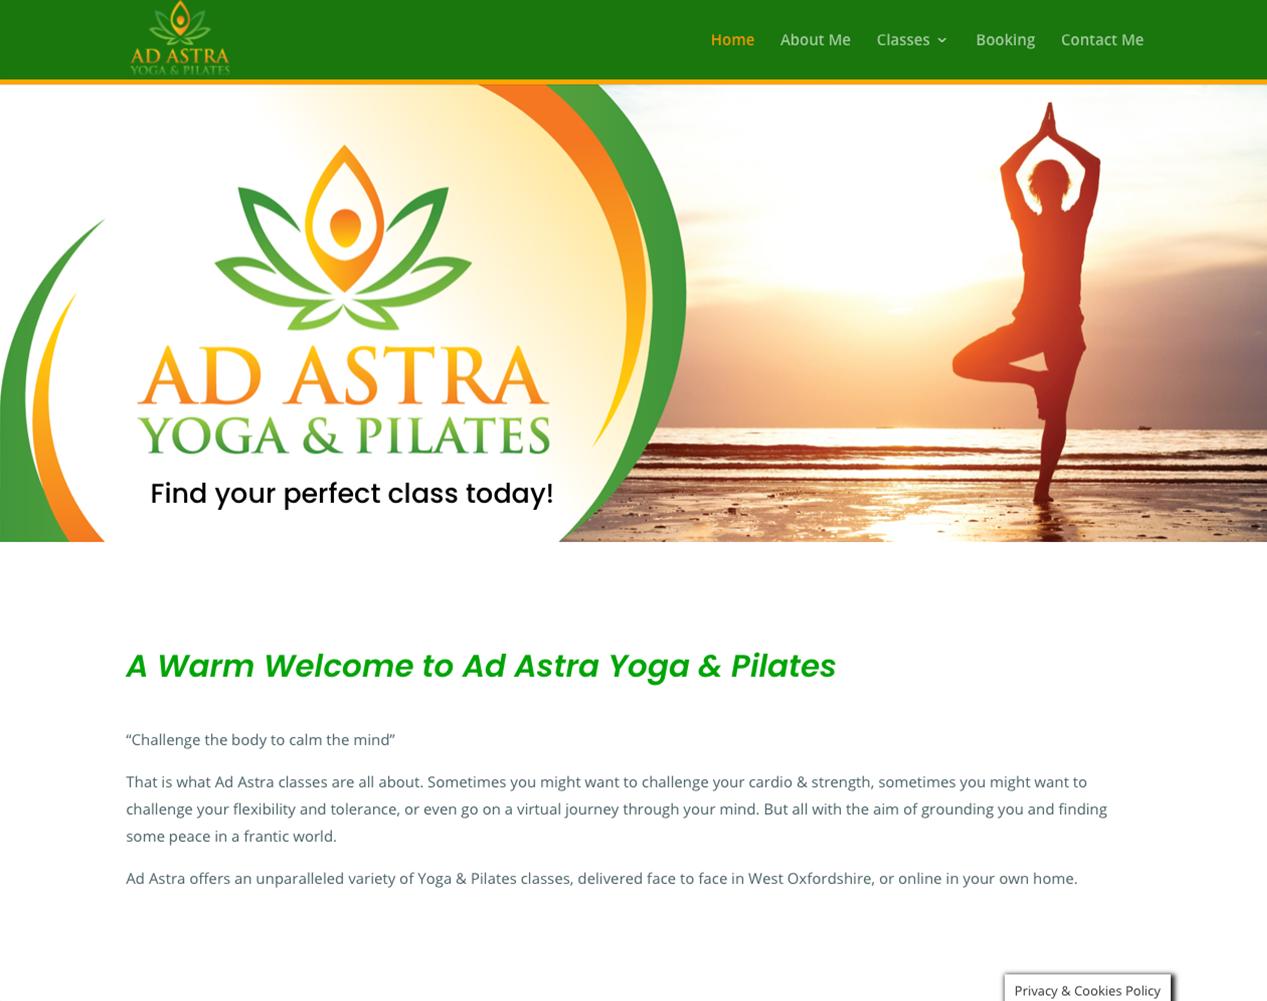 Ad Astra Yoga